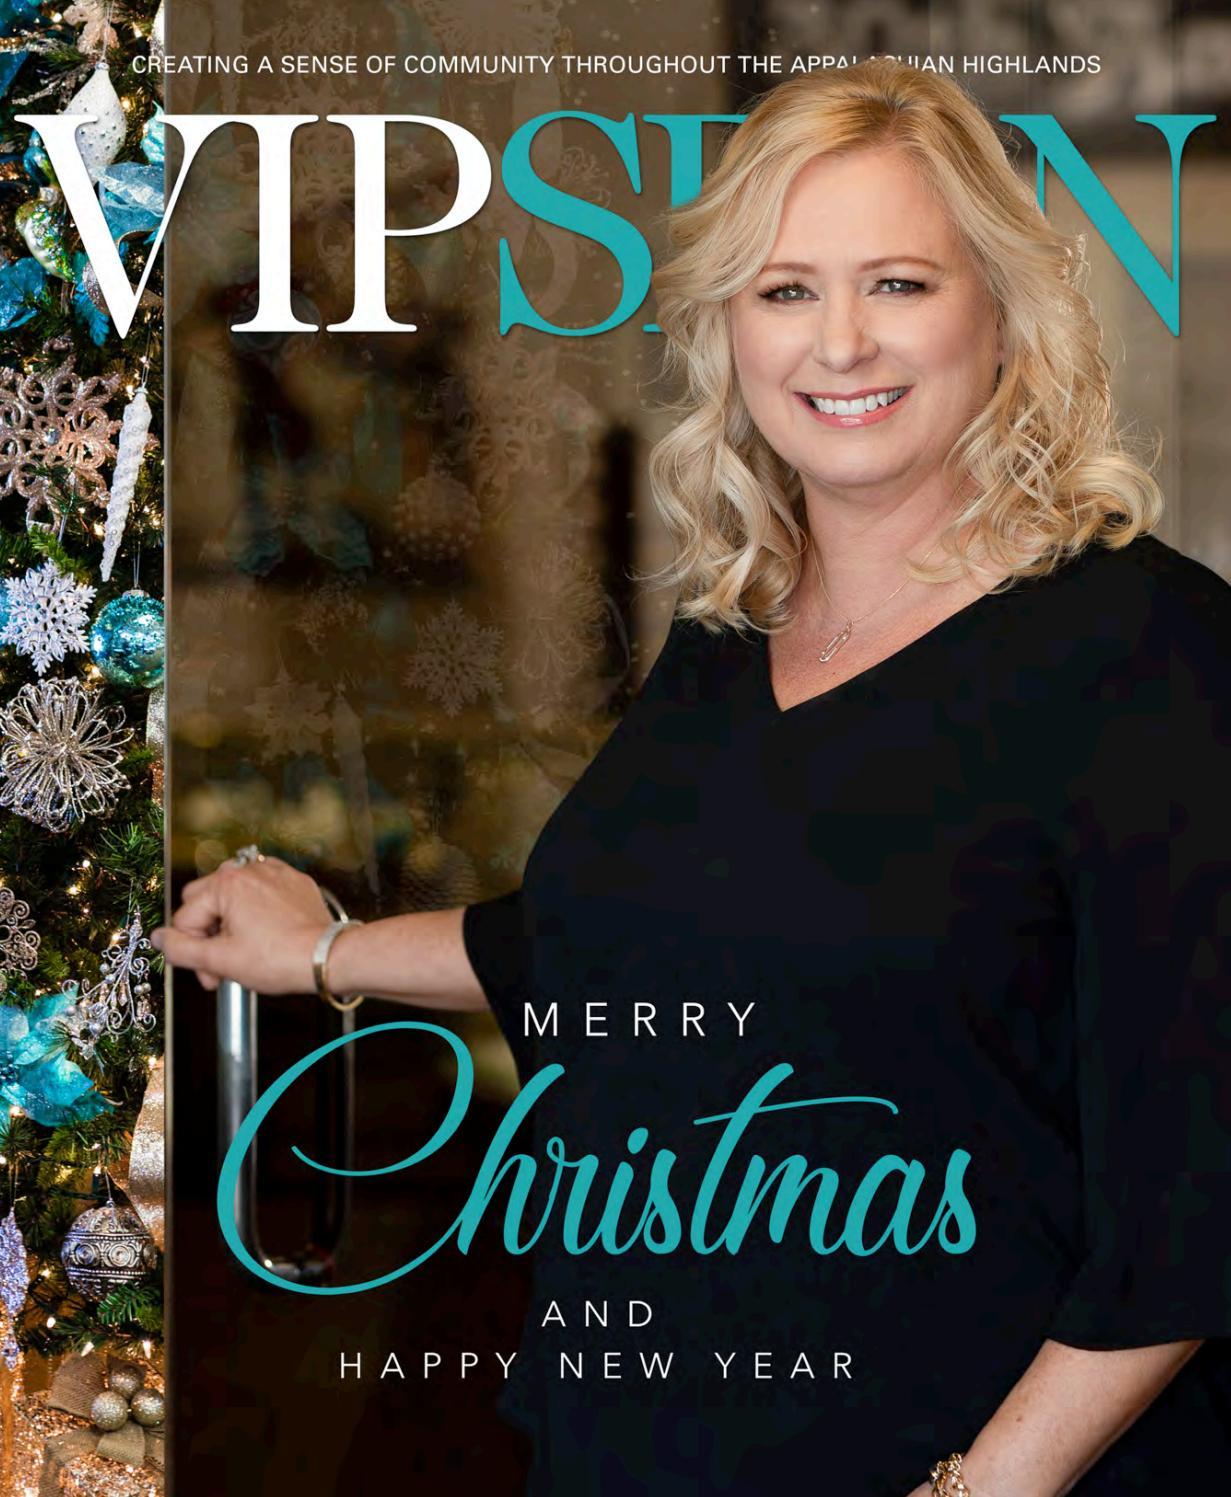 Christmas Craft Fair At Carnegie Johnson City Tn Dec 2nd 2020 VIPSEEN December 2019   January 2020 by VIPSEEN   issuu